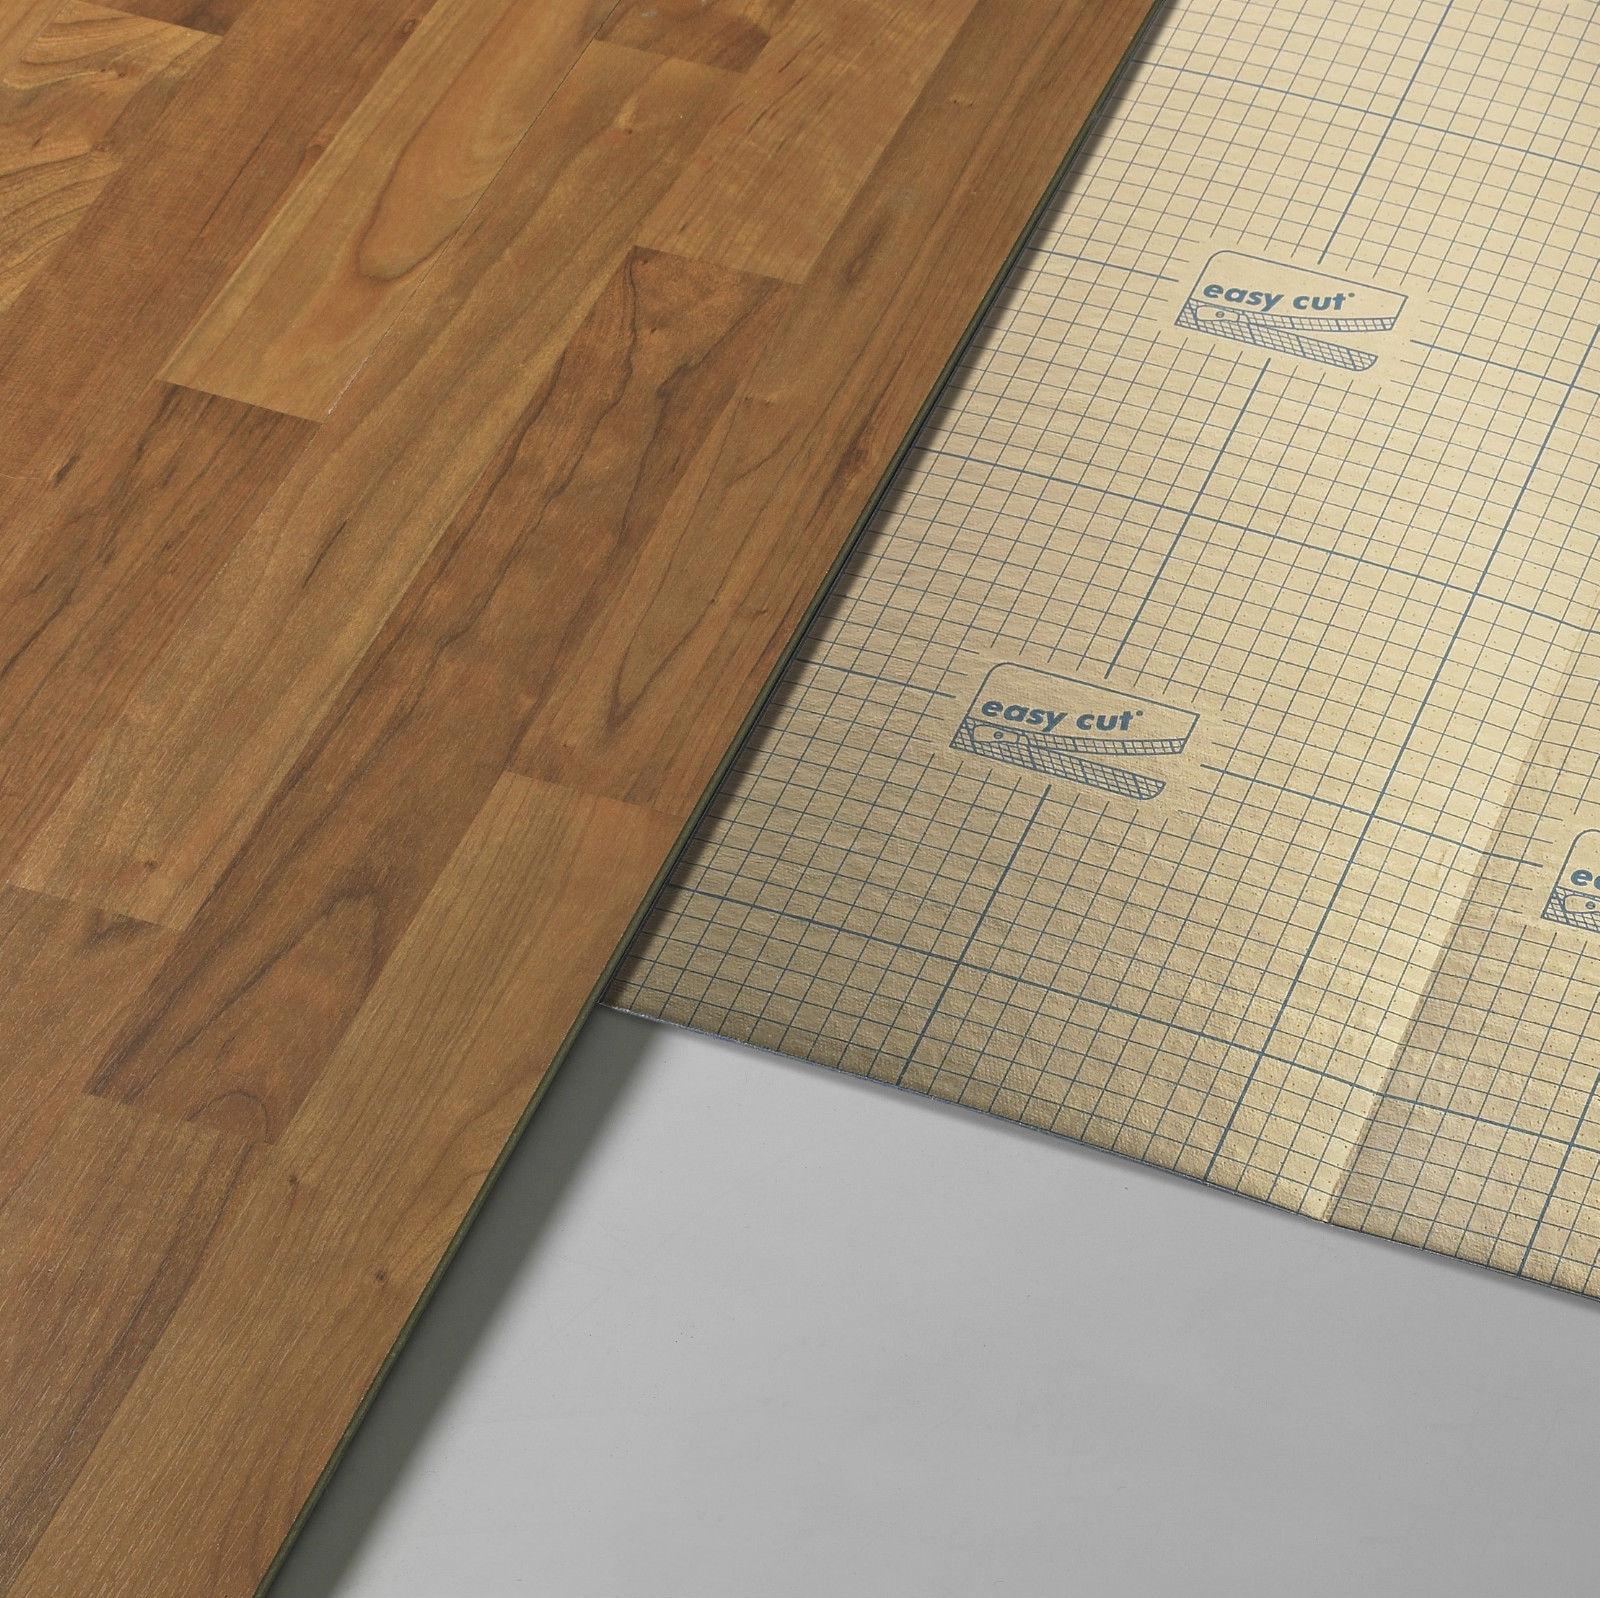 hori designboden vinyl pvc frei klick eiche altholz rustik fase d mmung leisten ebay. Black Bedroom Furniture Sets. Home Design Ideas